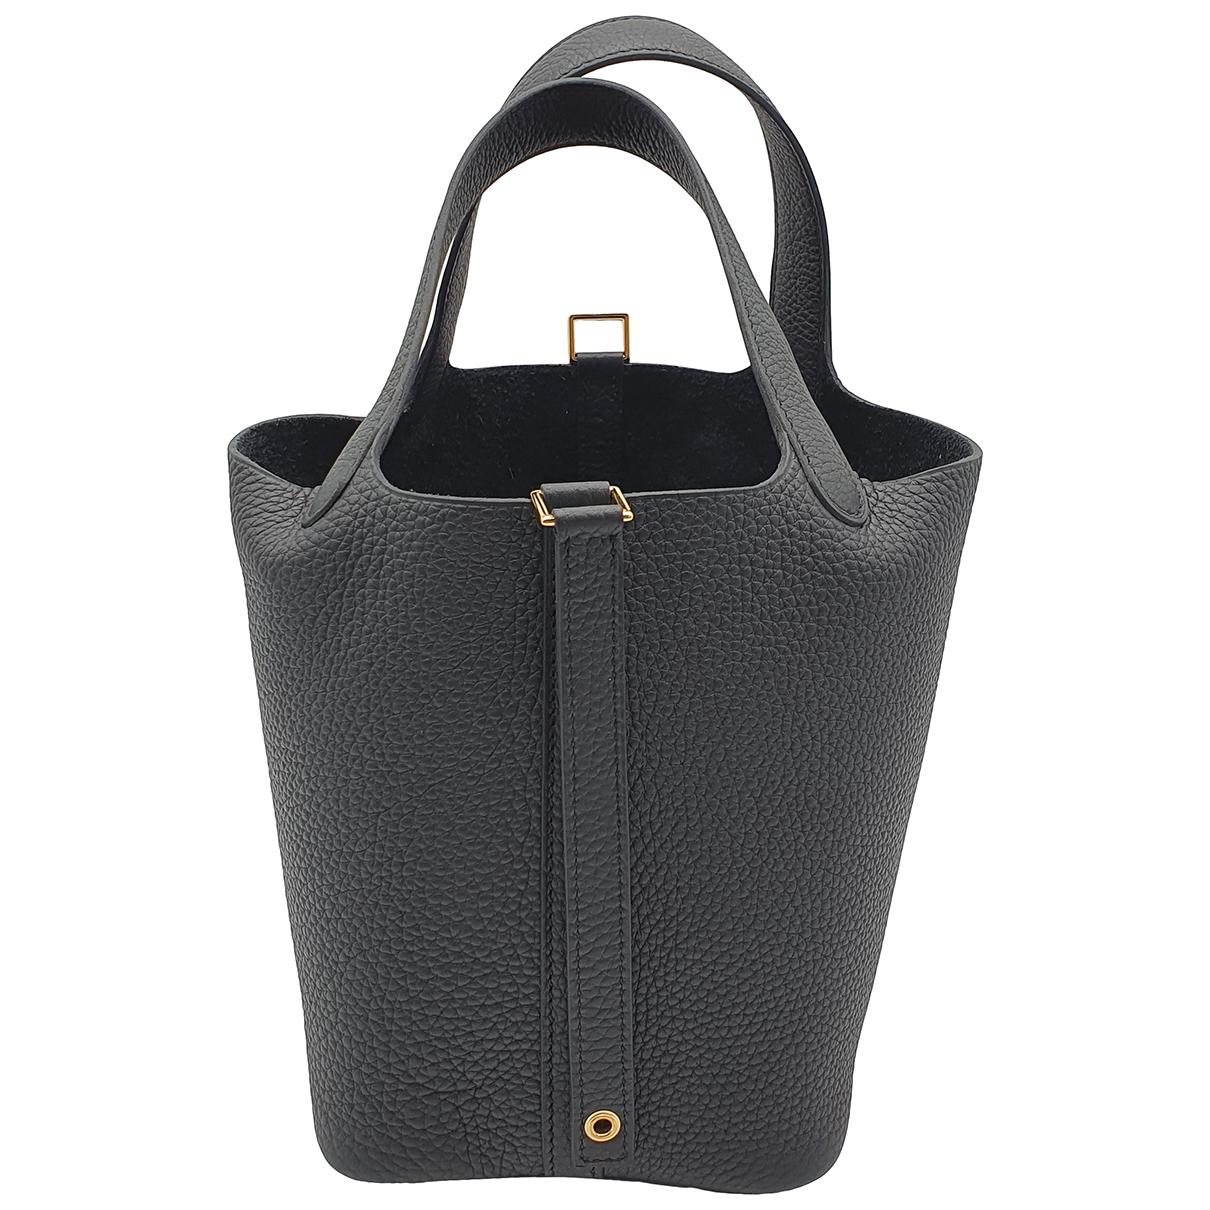 Hermes Picotin Handtasche in  Schwarz Leder